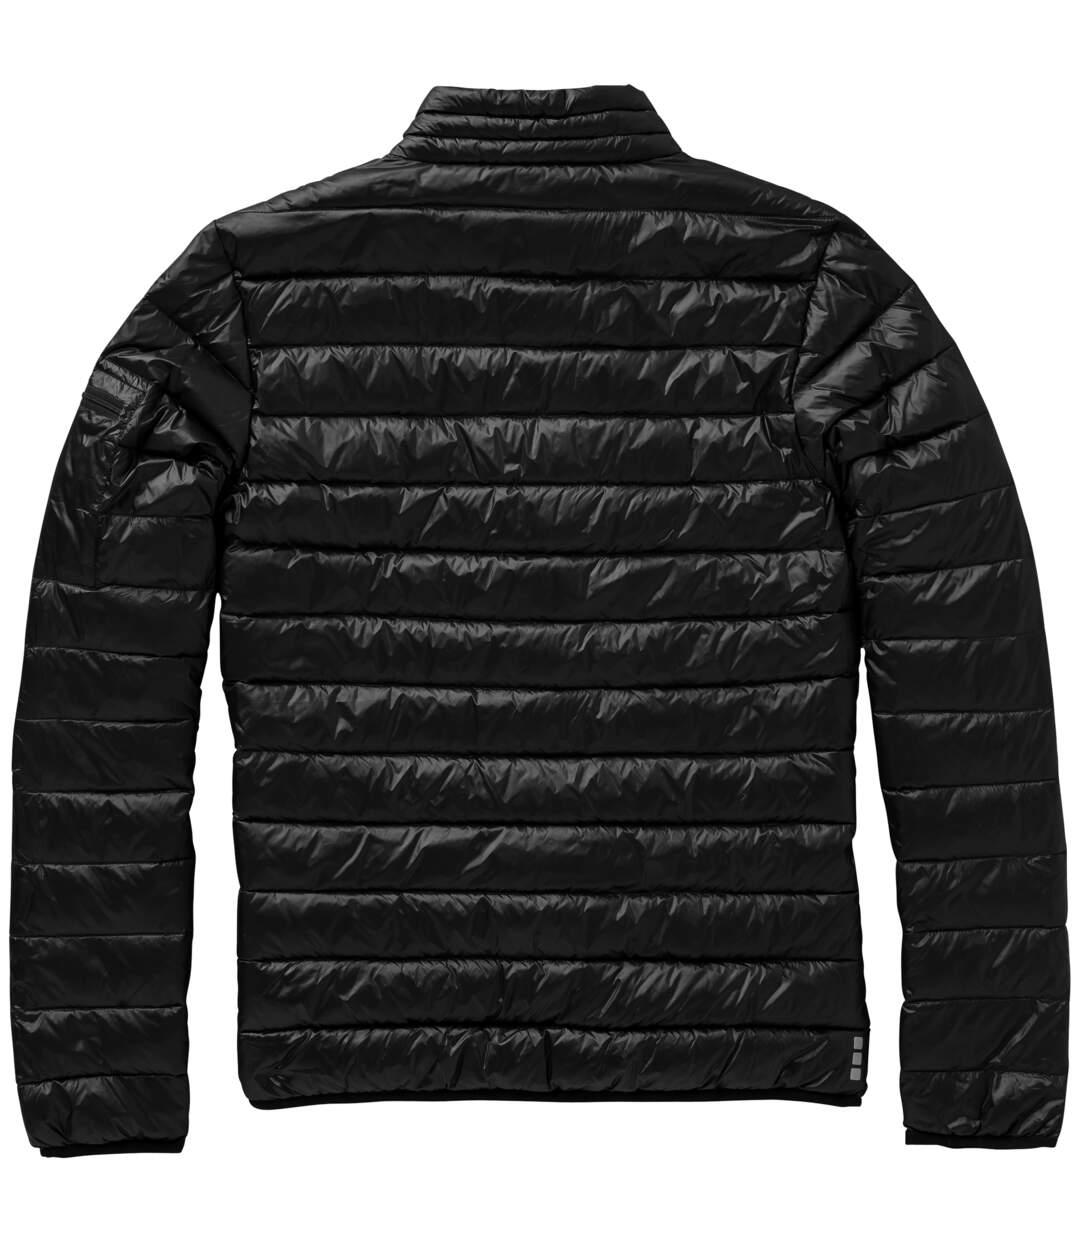 Elevate Mens Scotia Light Down Jacket (Solid Black) - UTPF1901